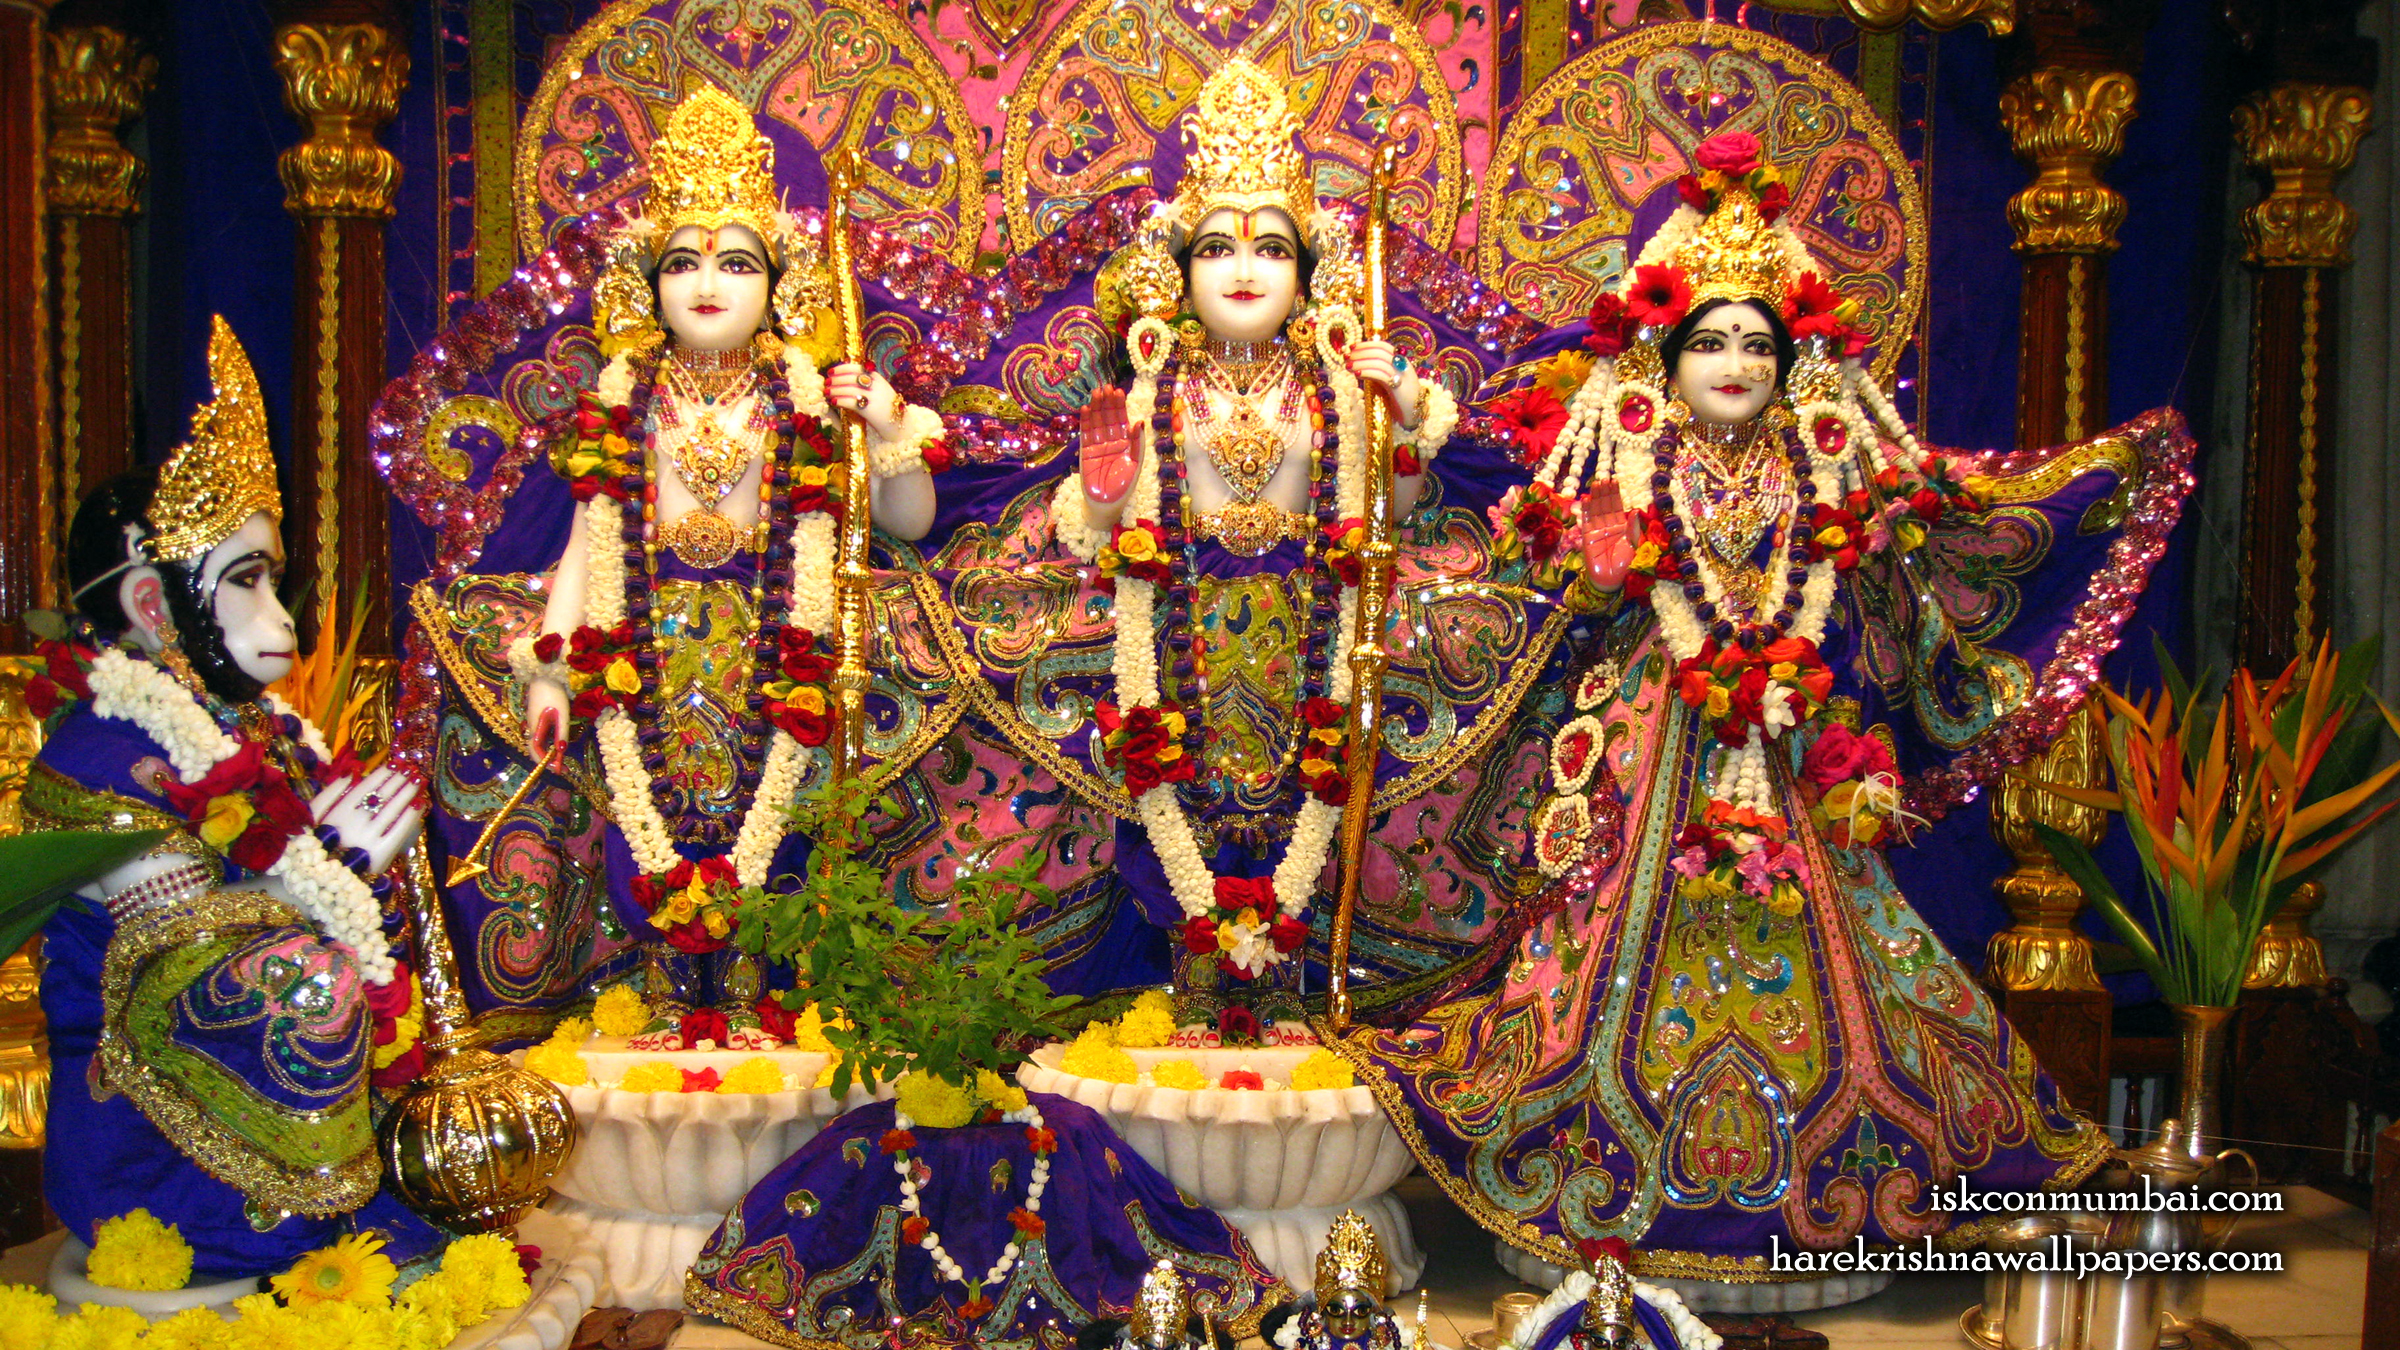 Sri Sri Sita Rama Laxman Hanuman Wallpaper (001) Size 2400x1350 Download